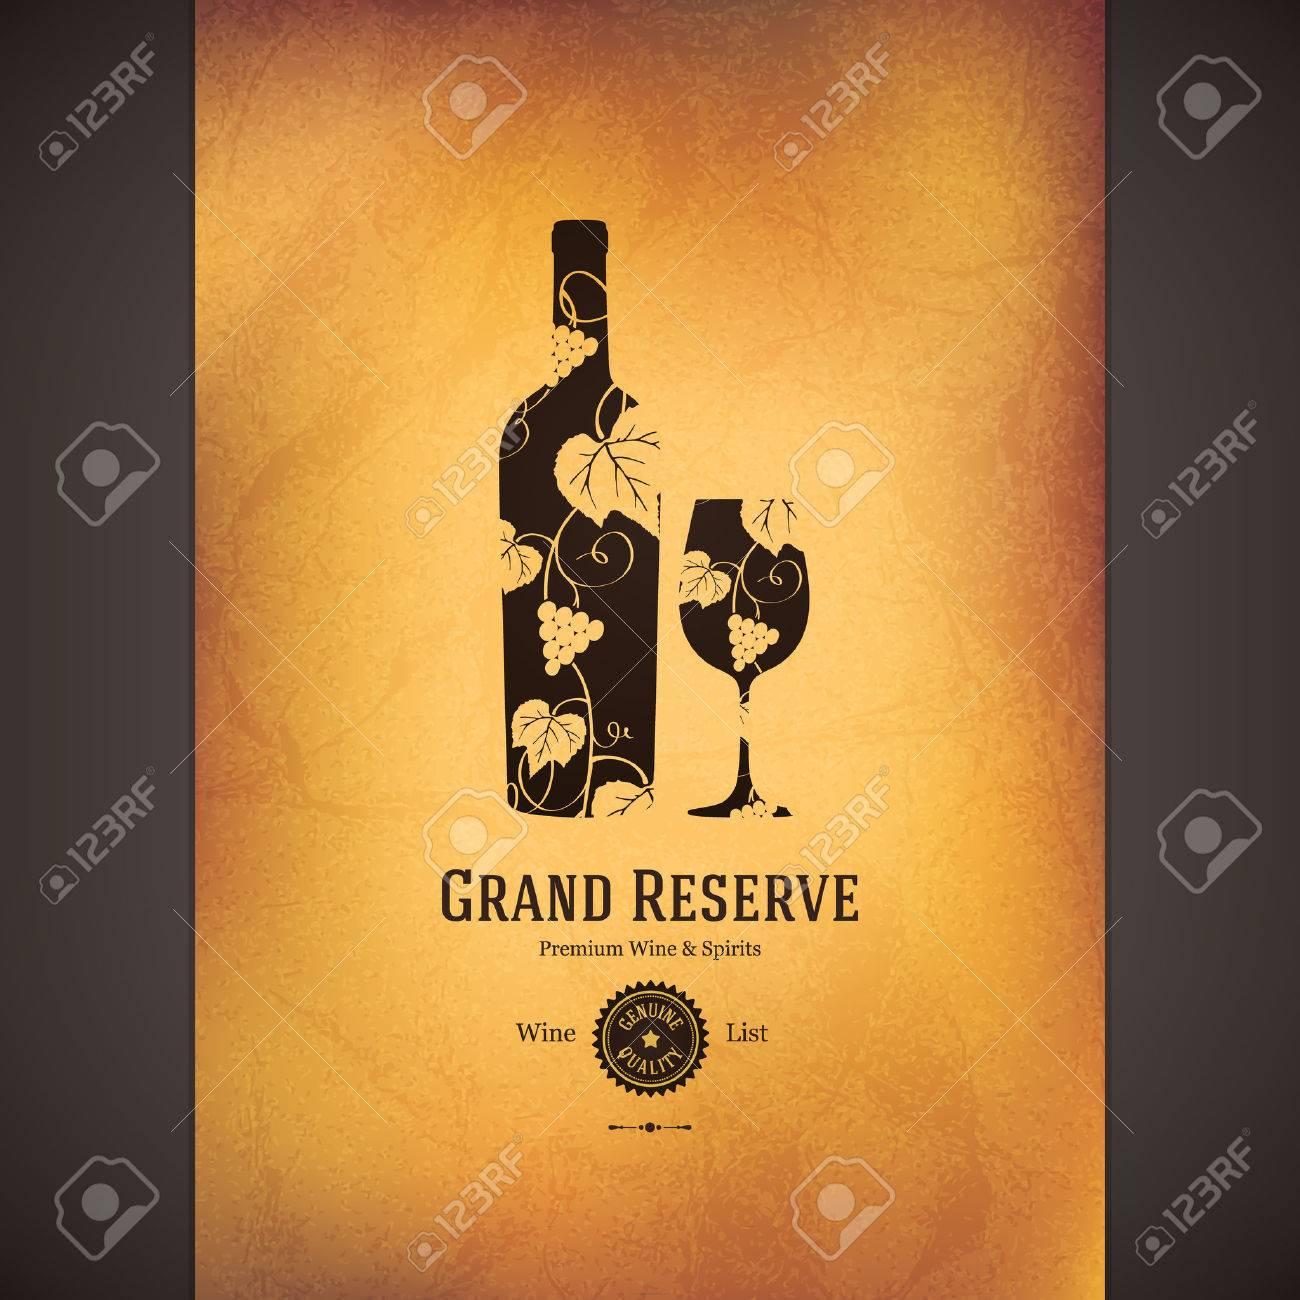 Wine list design Stock Vector - 23036405